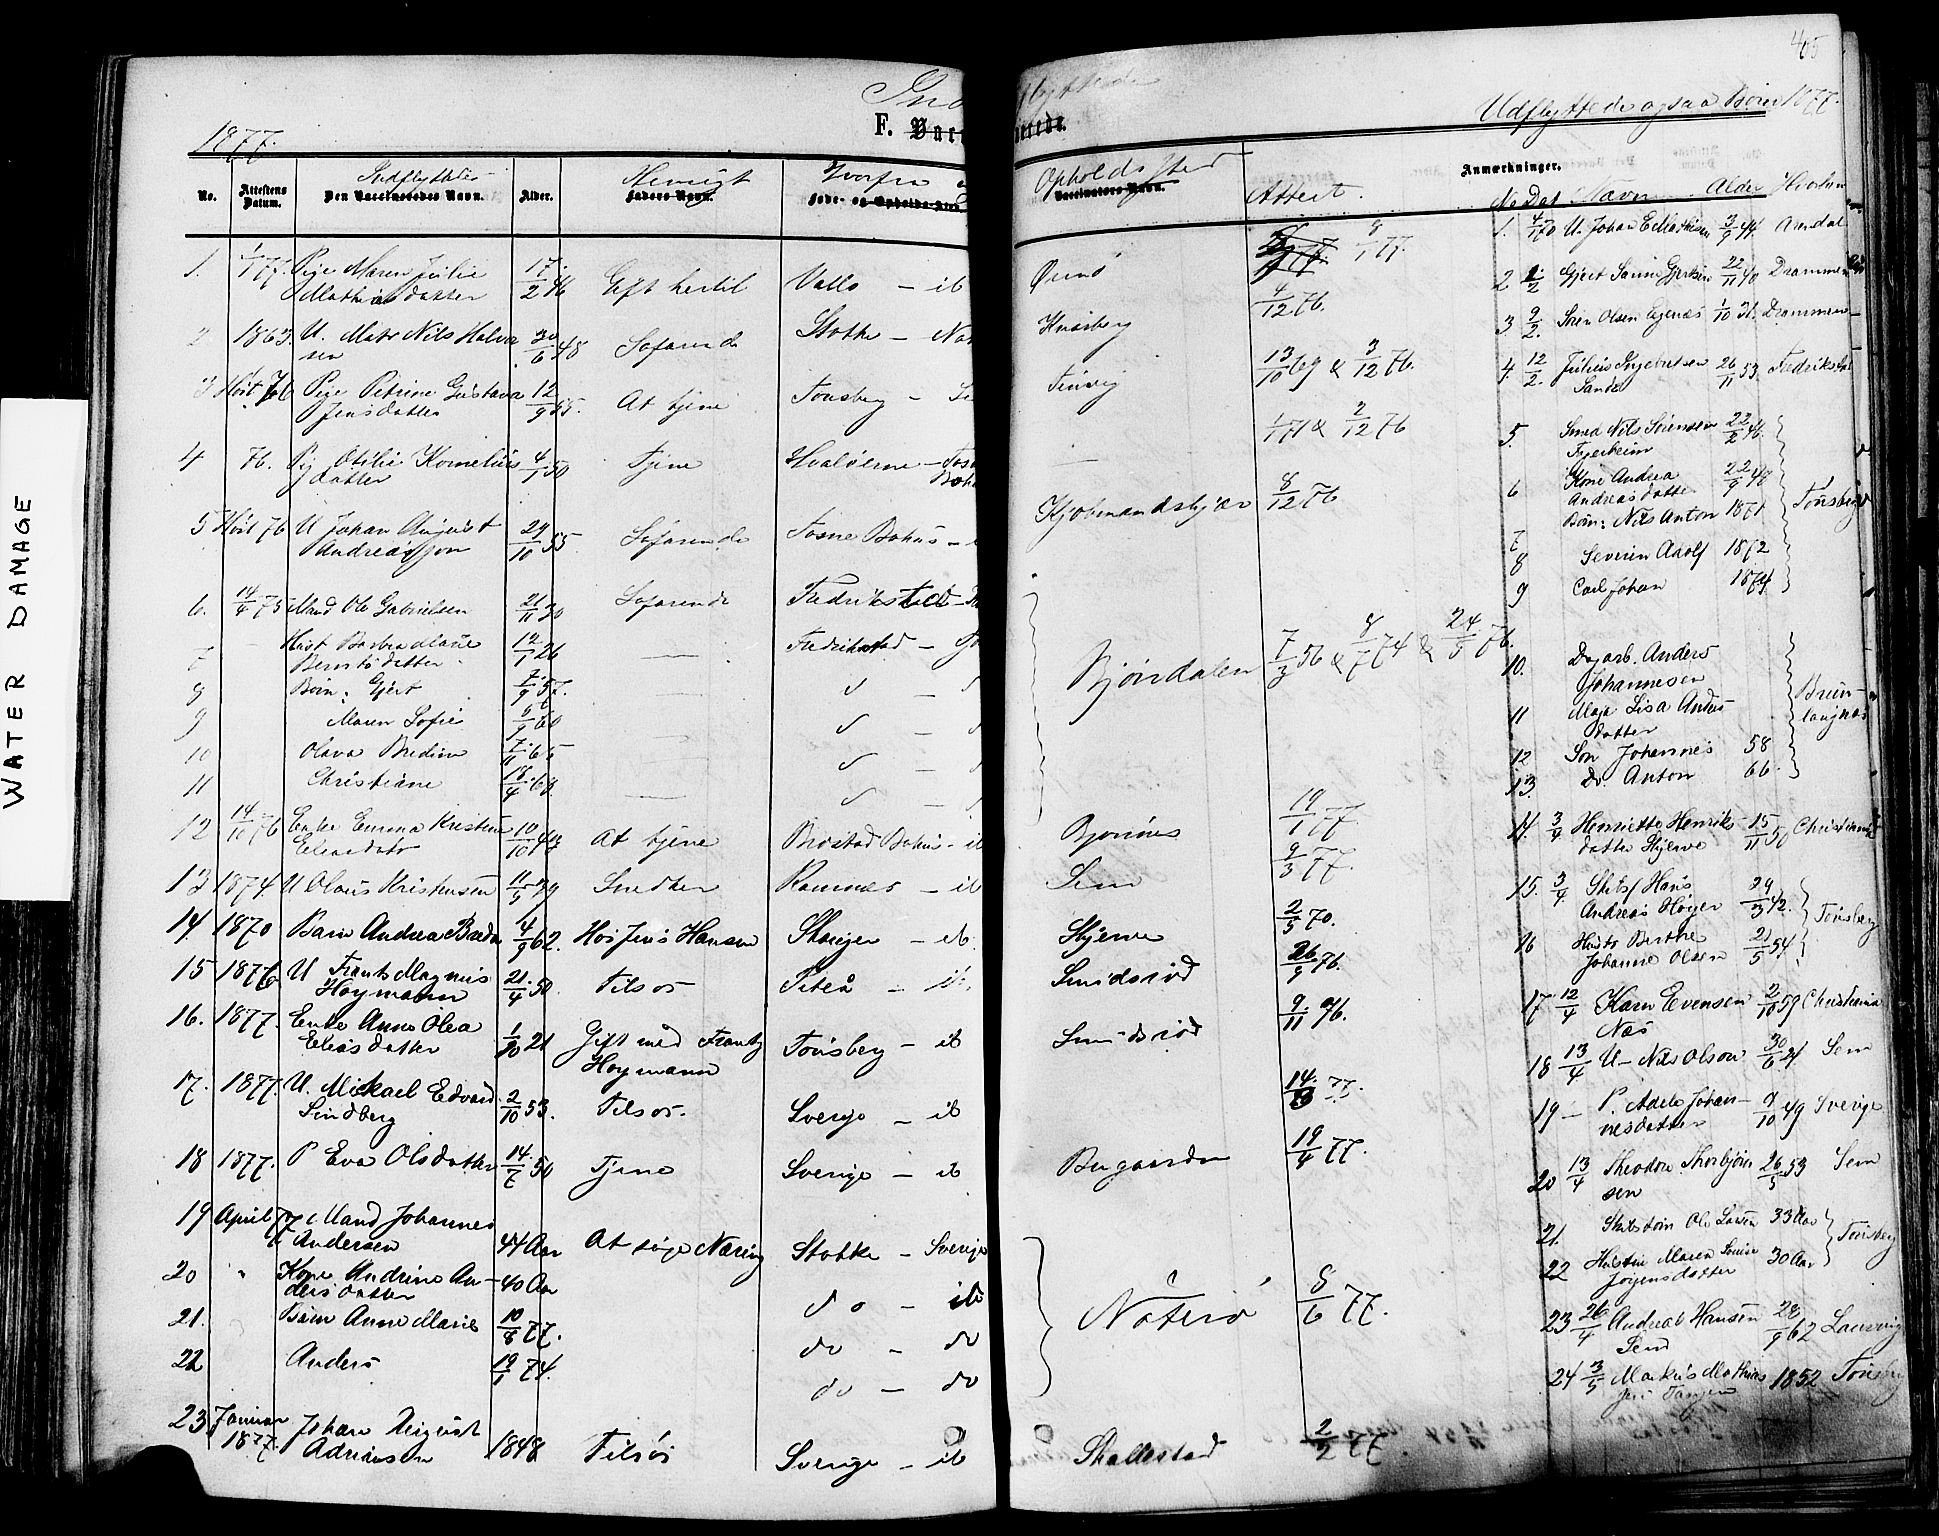 SAKO, Nøtterøy kirkebøker, F/Fa/L0007: Ministerialbok nr. I 7, 1865-1877, s. 405